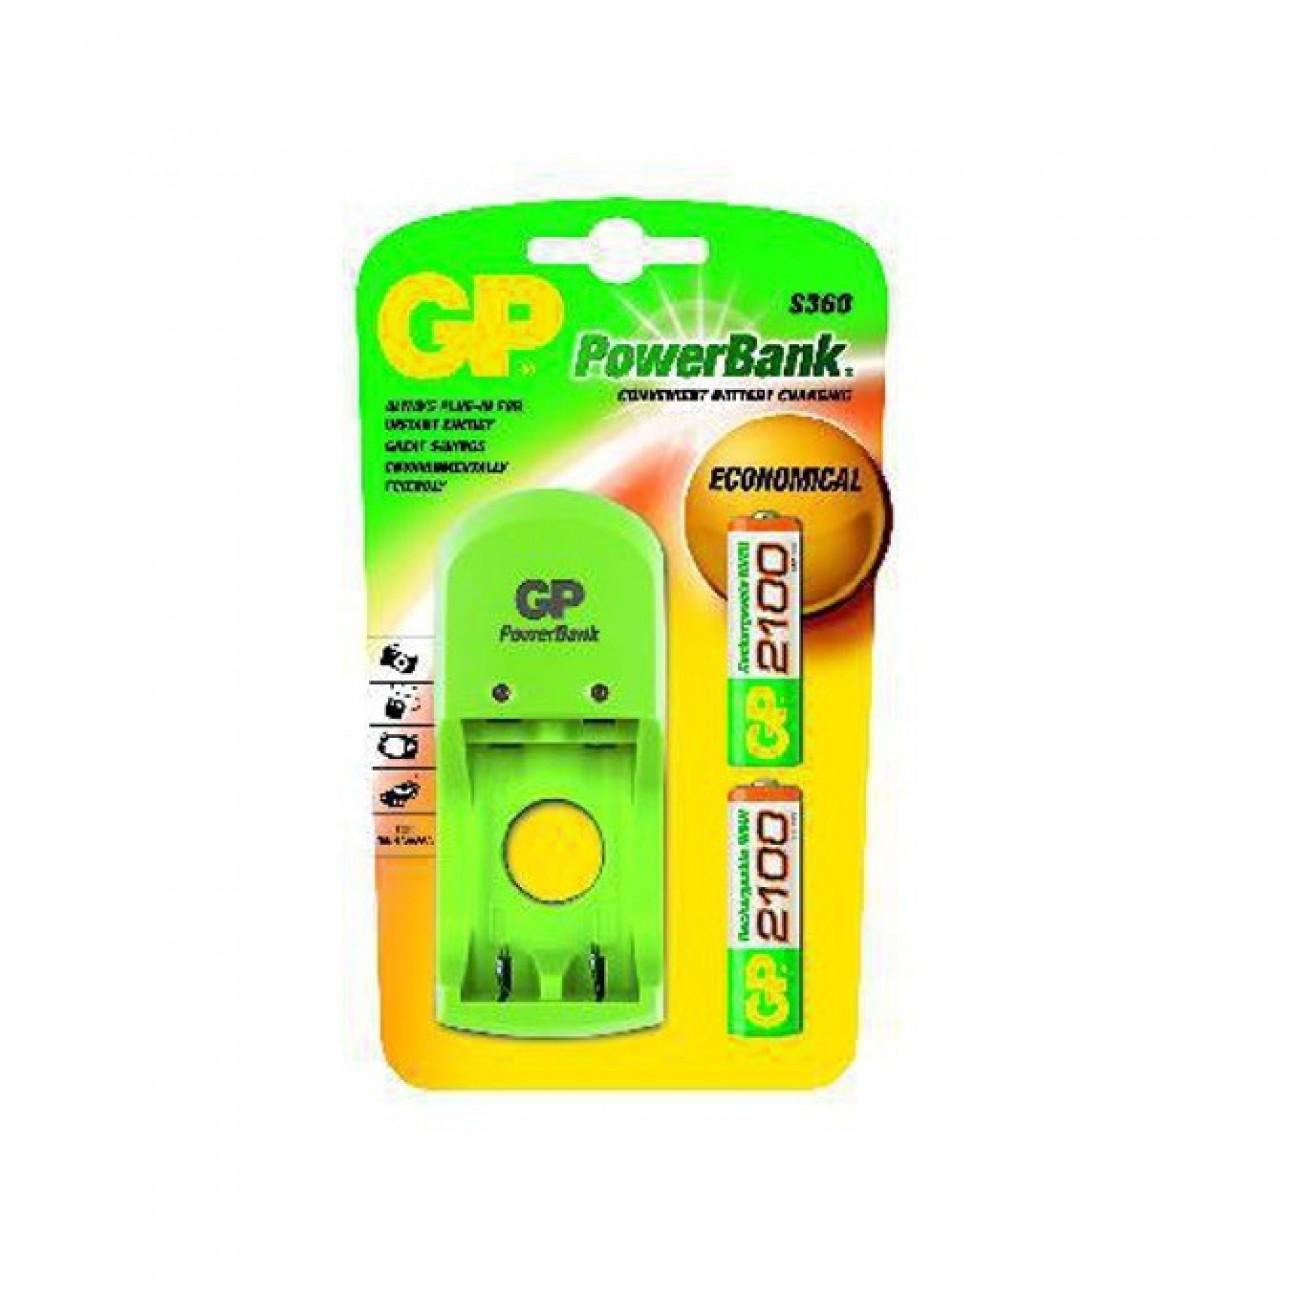 Зарядно у-во GP PB410GS210, за батерии AA/AAA, 2xAA NiMH (2100mAh) батерии в Настолни компютри Процесори -  | Alleop